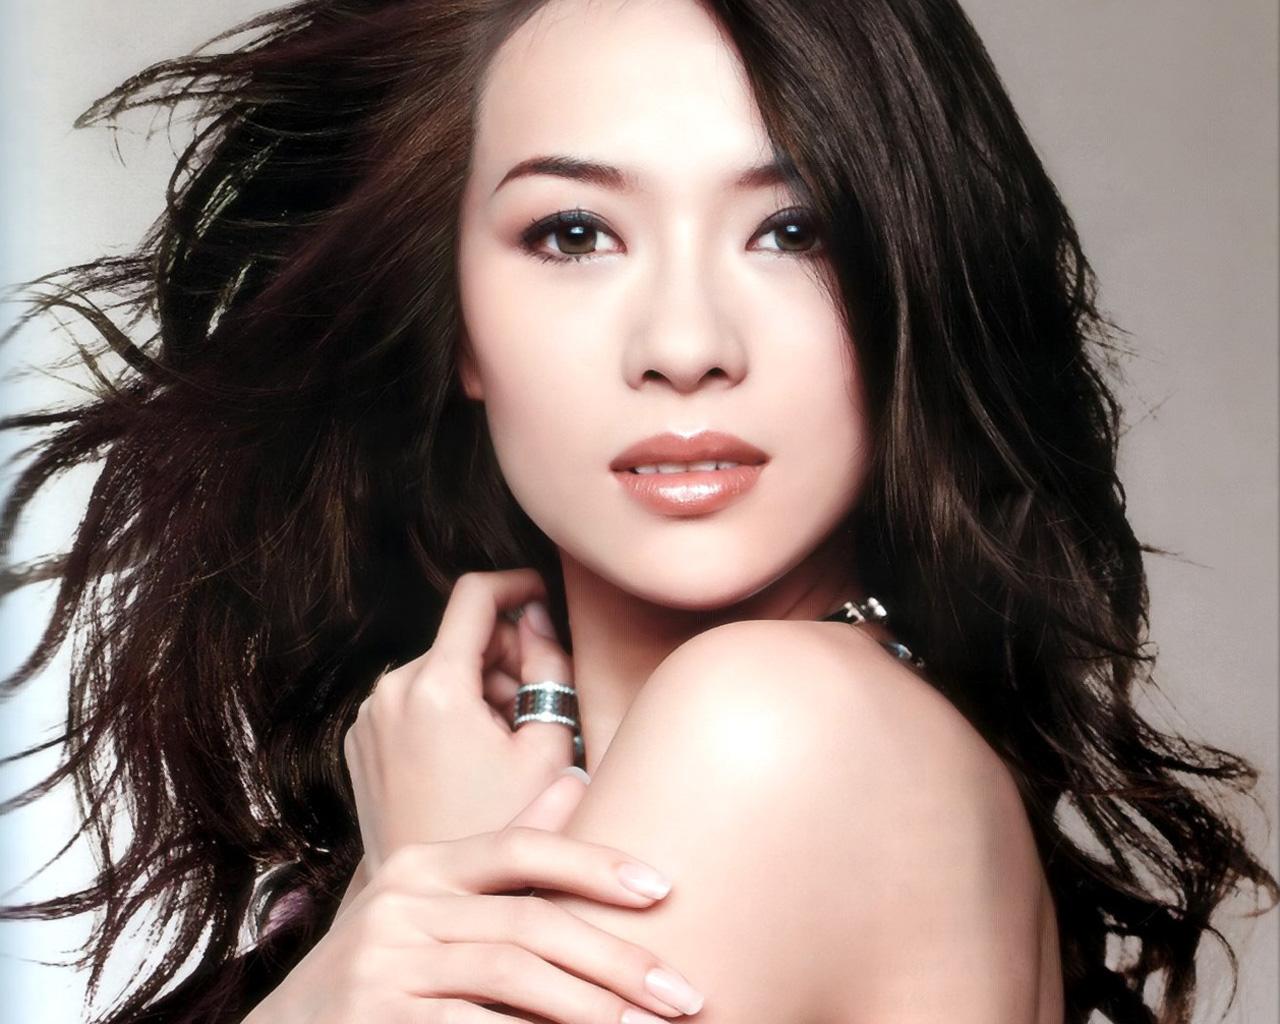 http://4.bp.blogspot.com/-nK3fmKOT-bM/T88XDr192GI/AAAAAAAAL4Y/_5lyLaSkehQ/s1600/zhang-ziyi.j+hair+style+pg.jpg